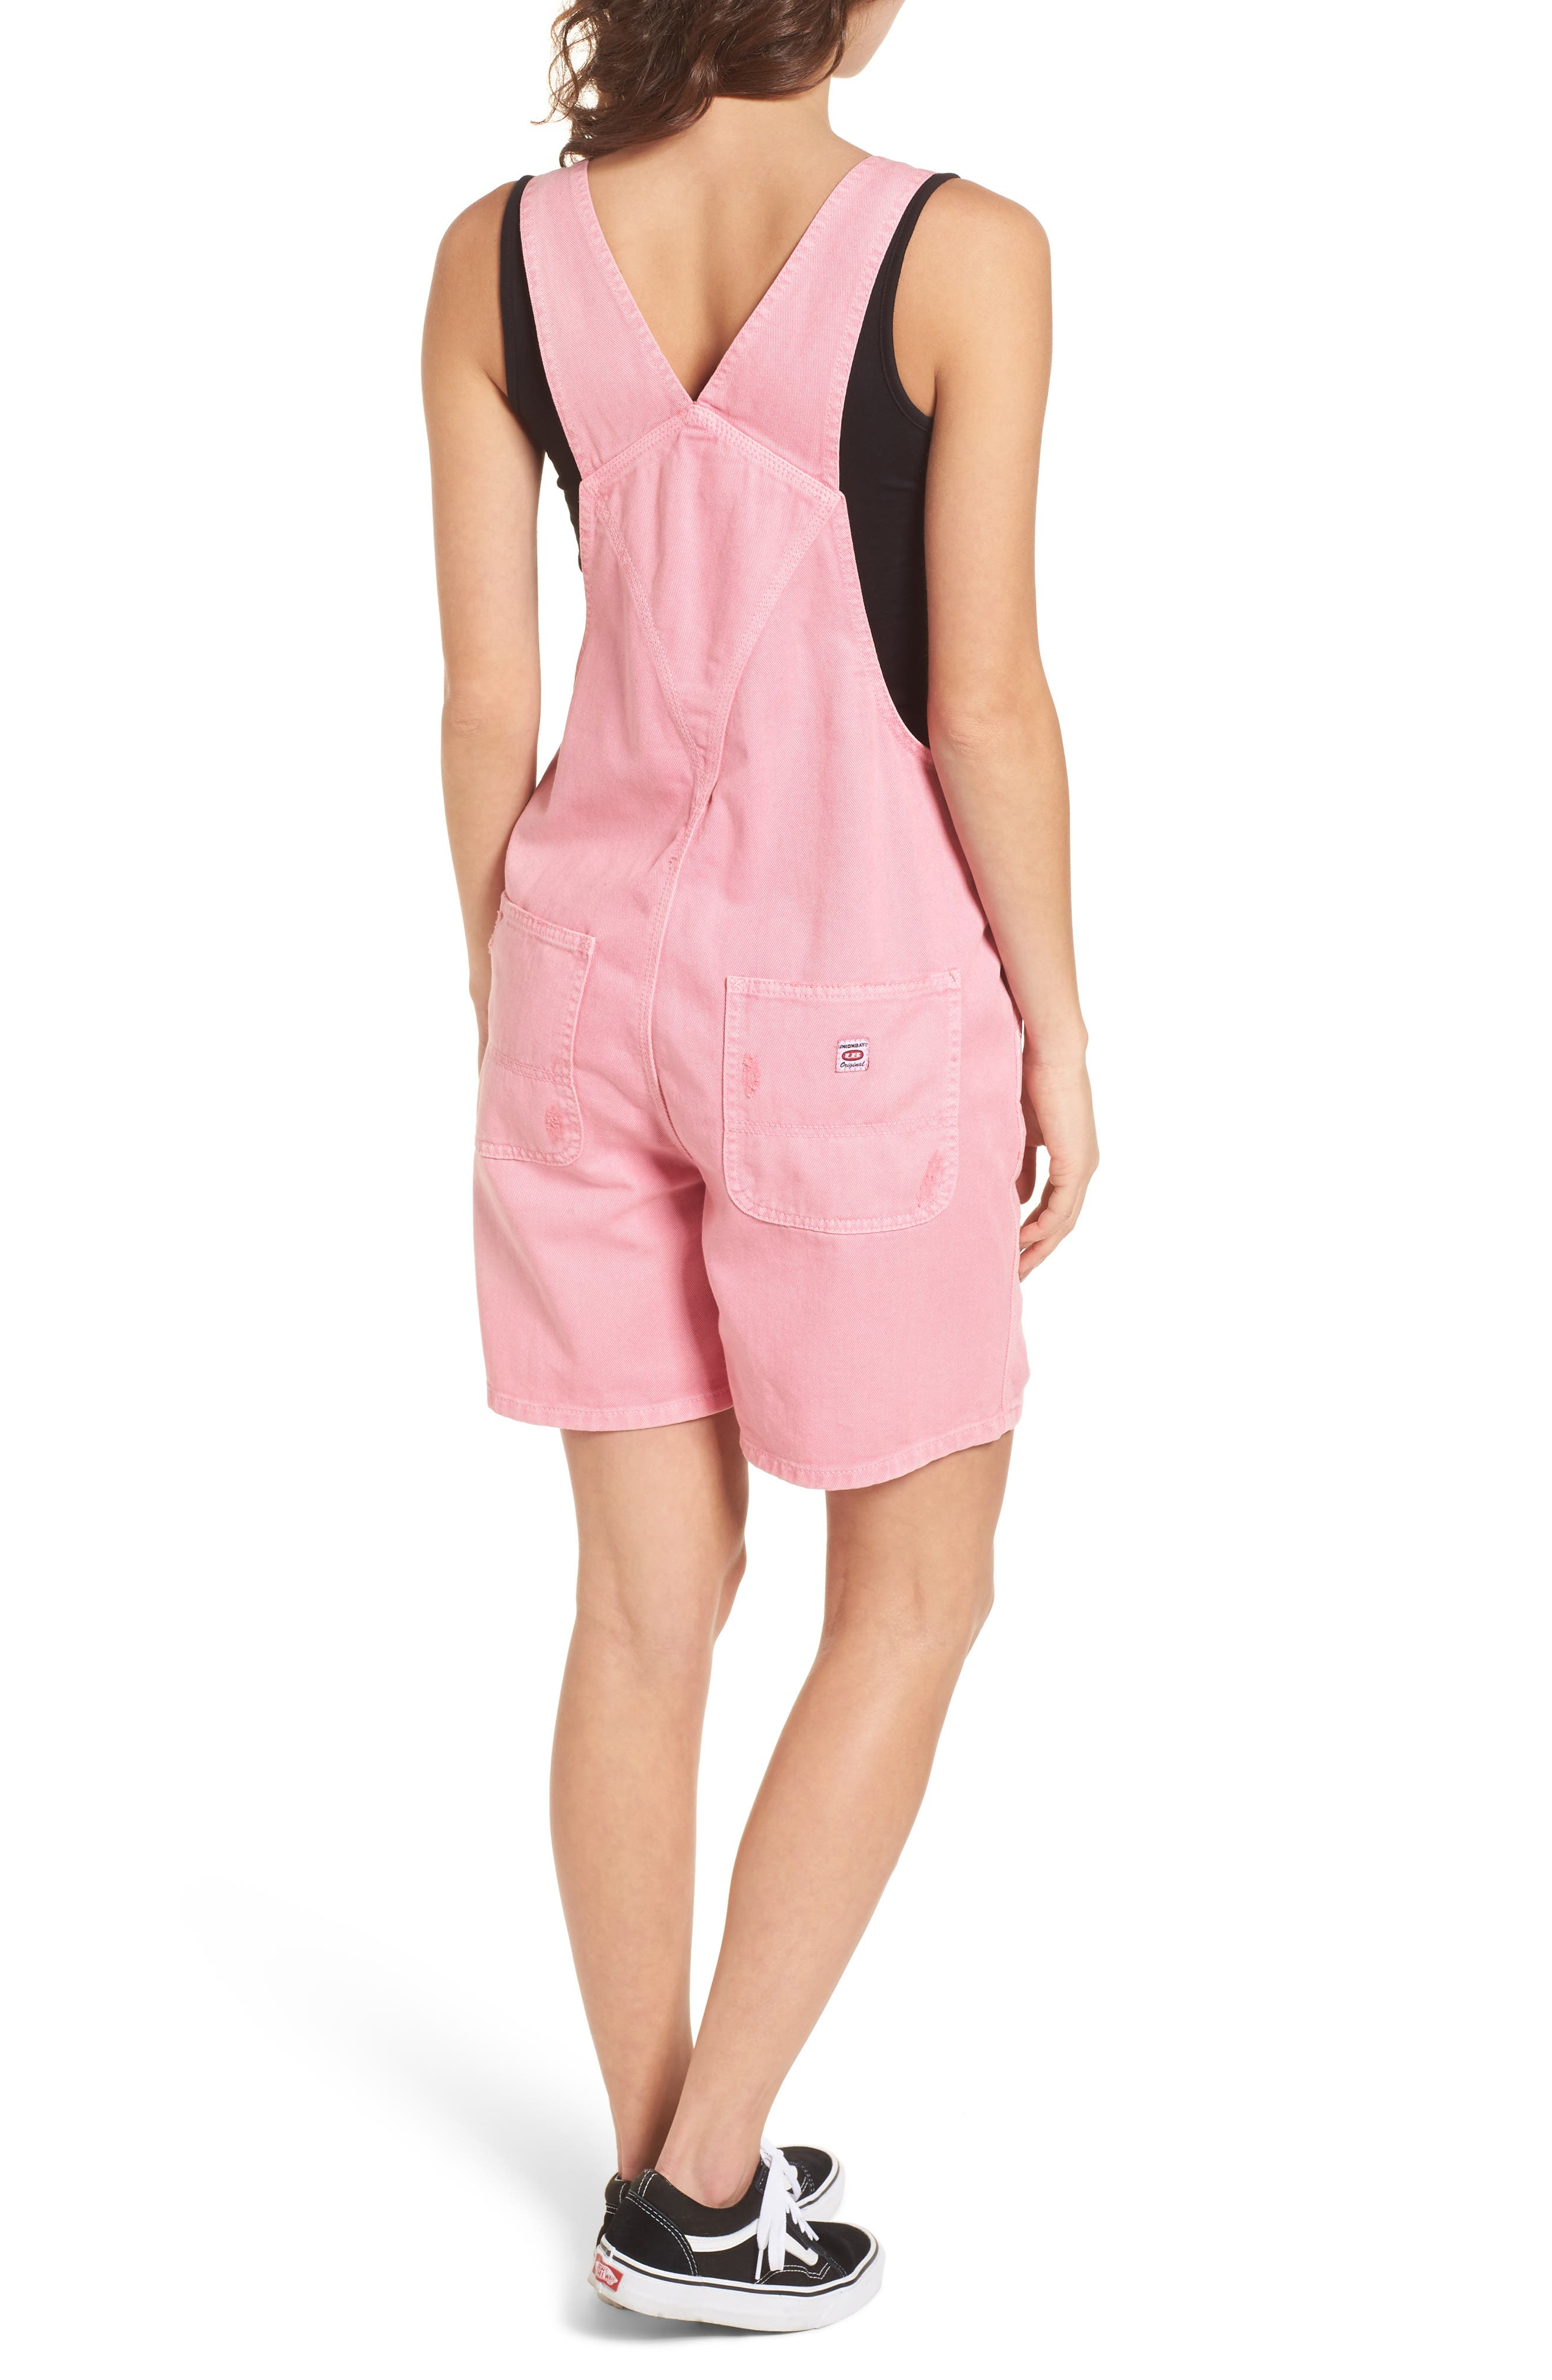 Unionbay Mario Denim Shortalls,                             Alternate thumbnail 2, color,                             Popsicle Pink